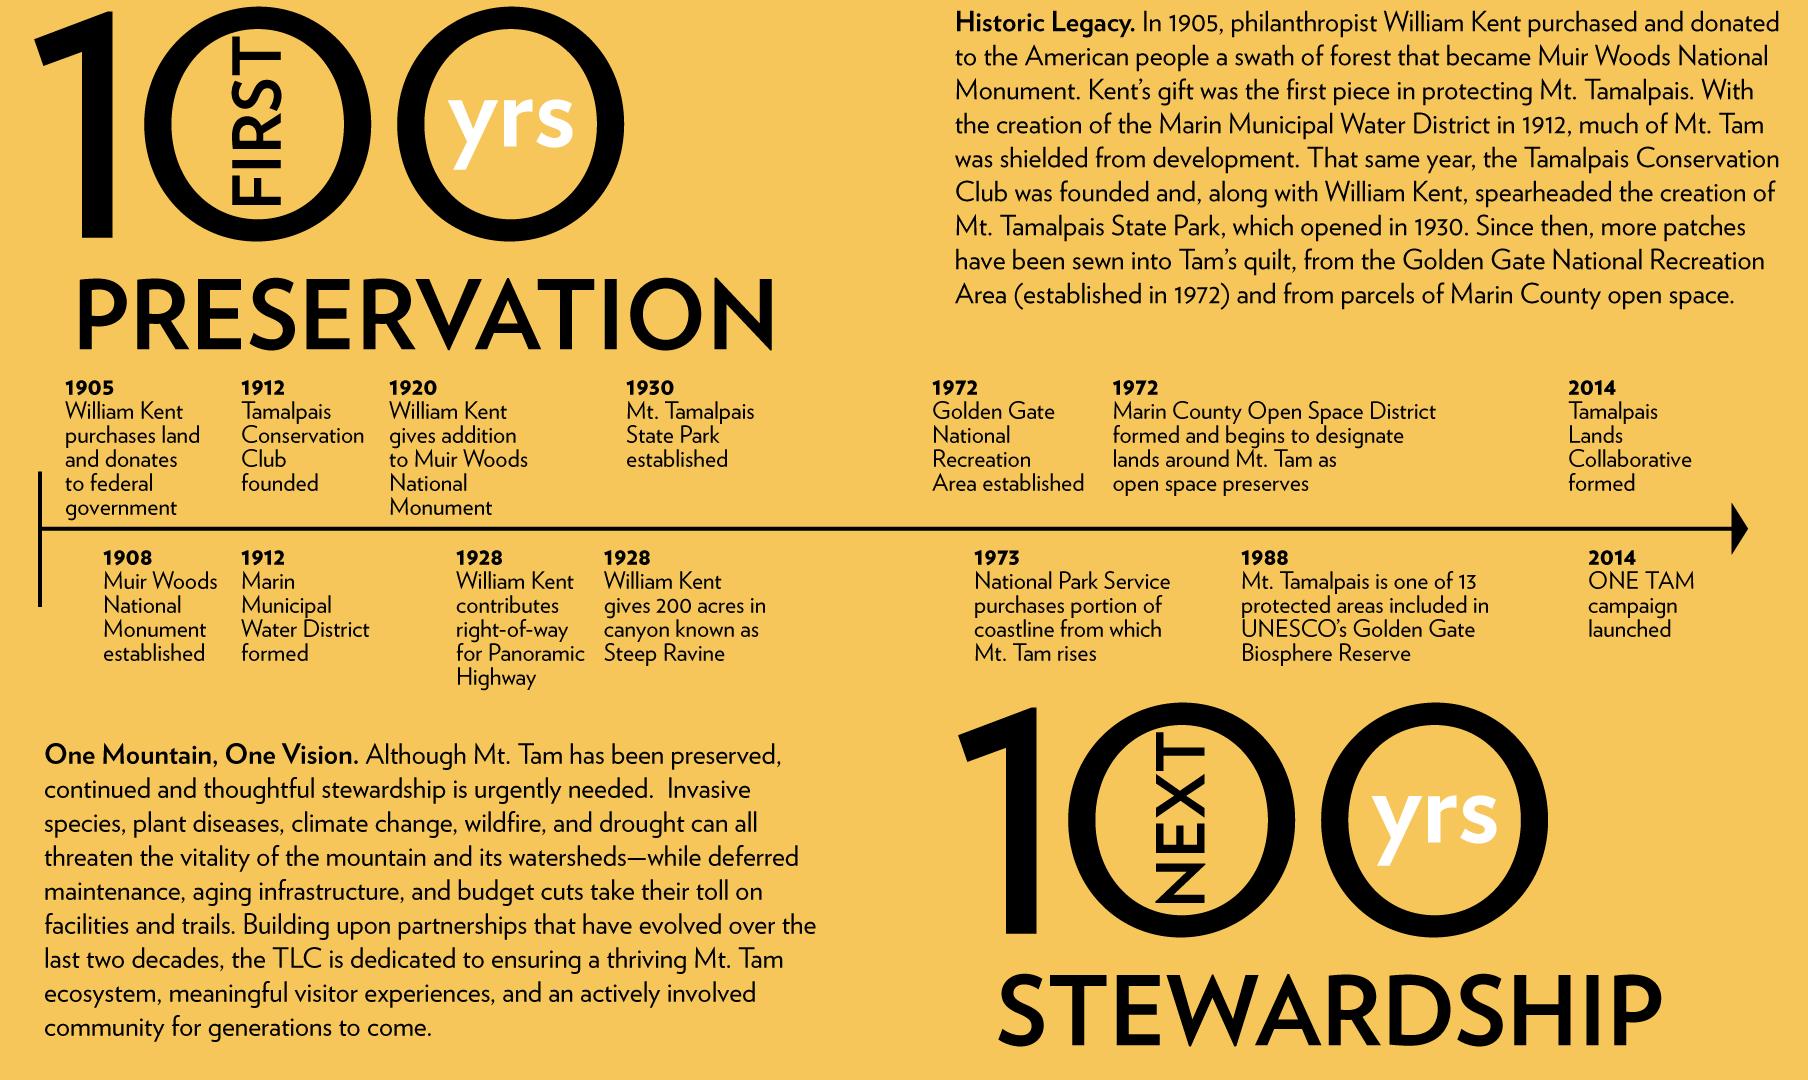 Mt Tam stewardship timeline